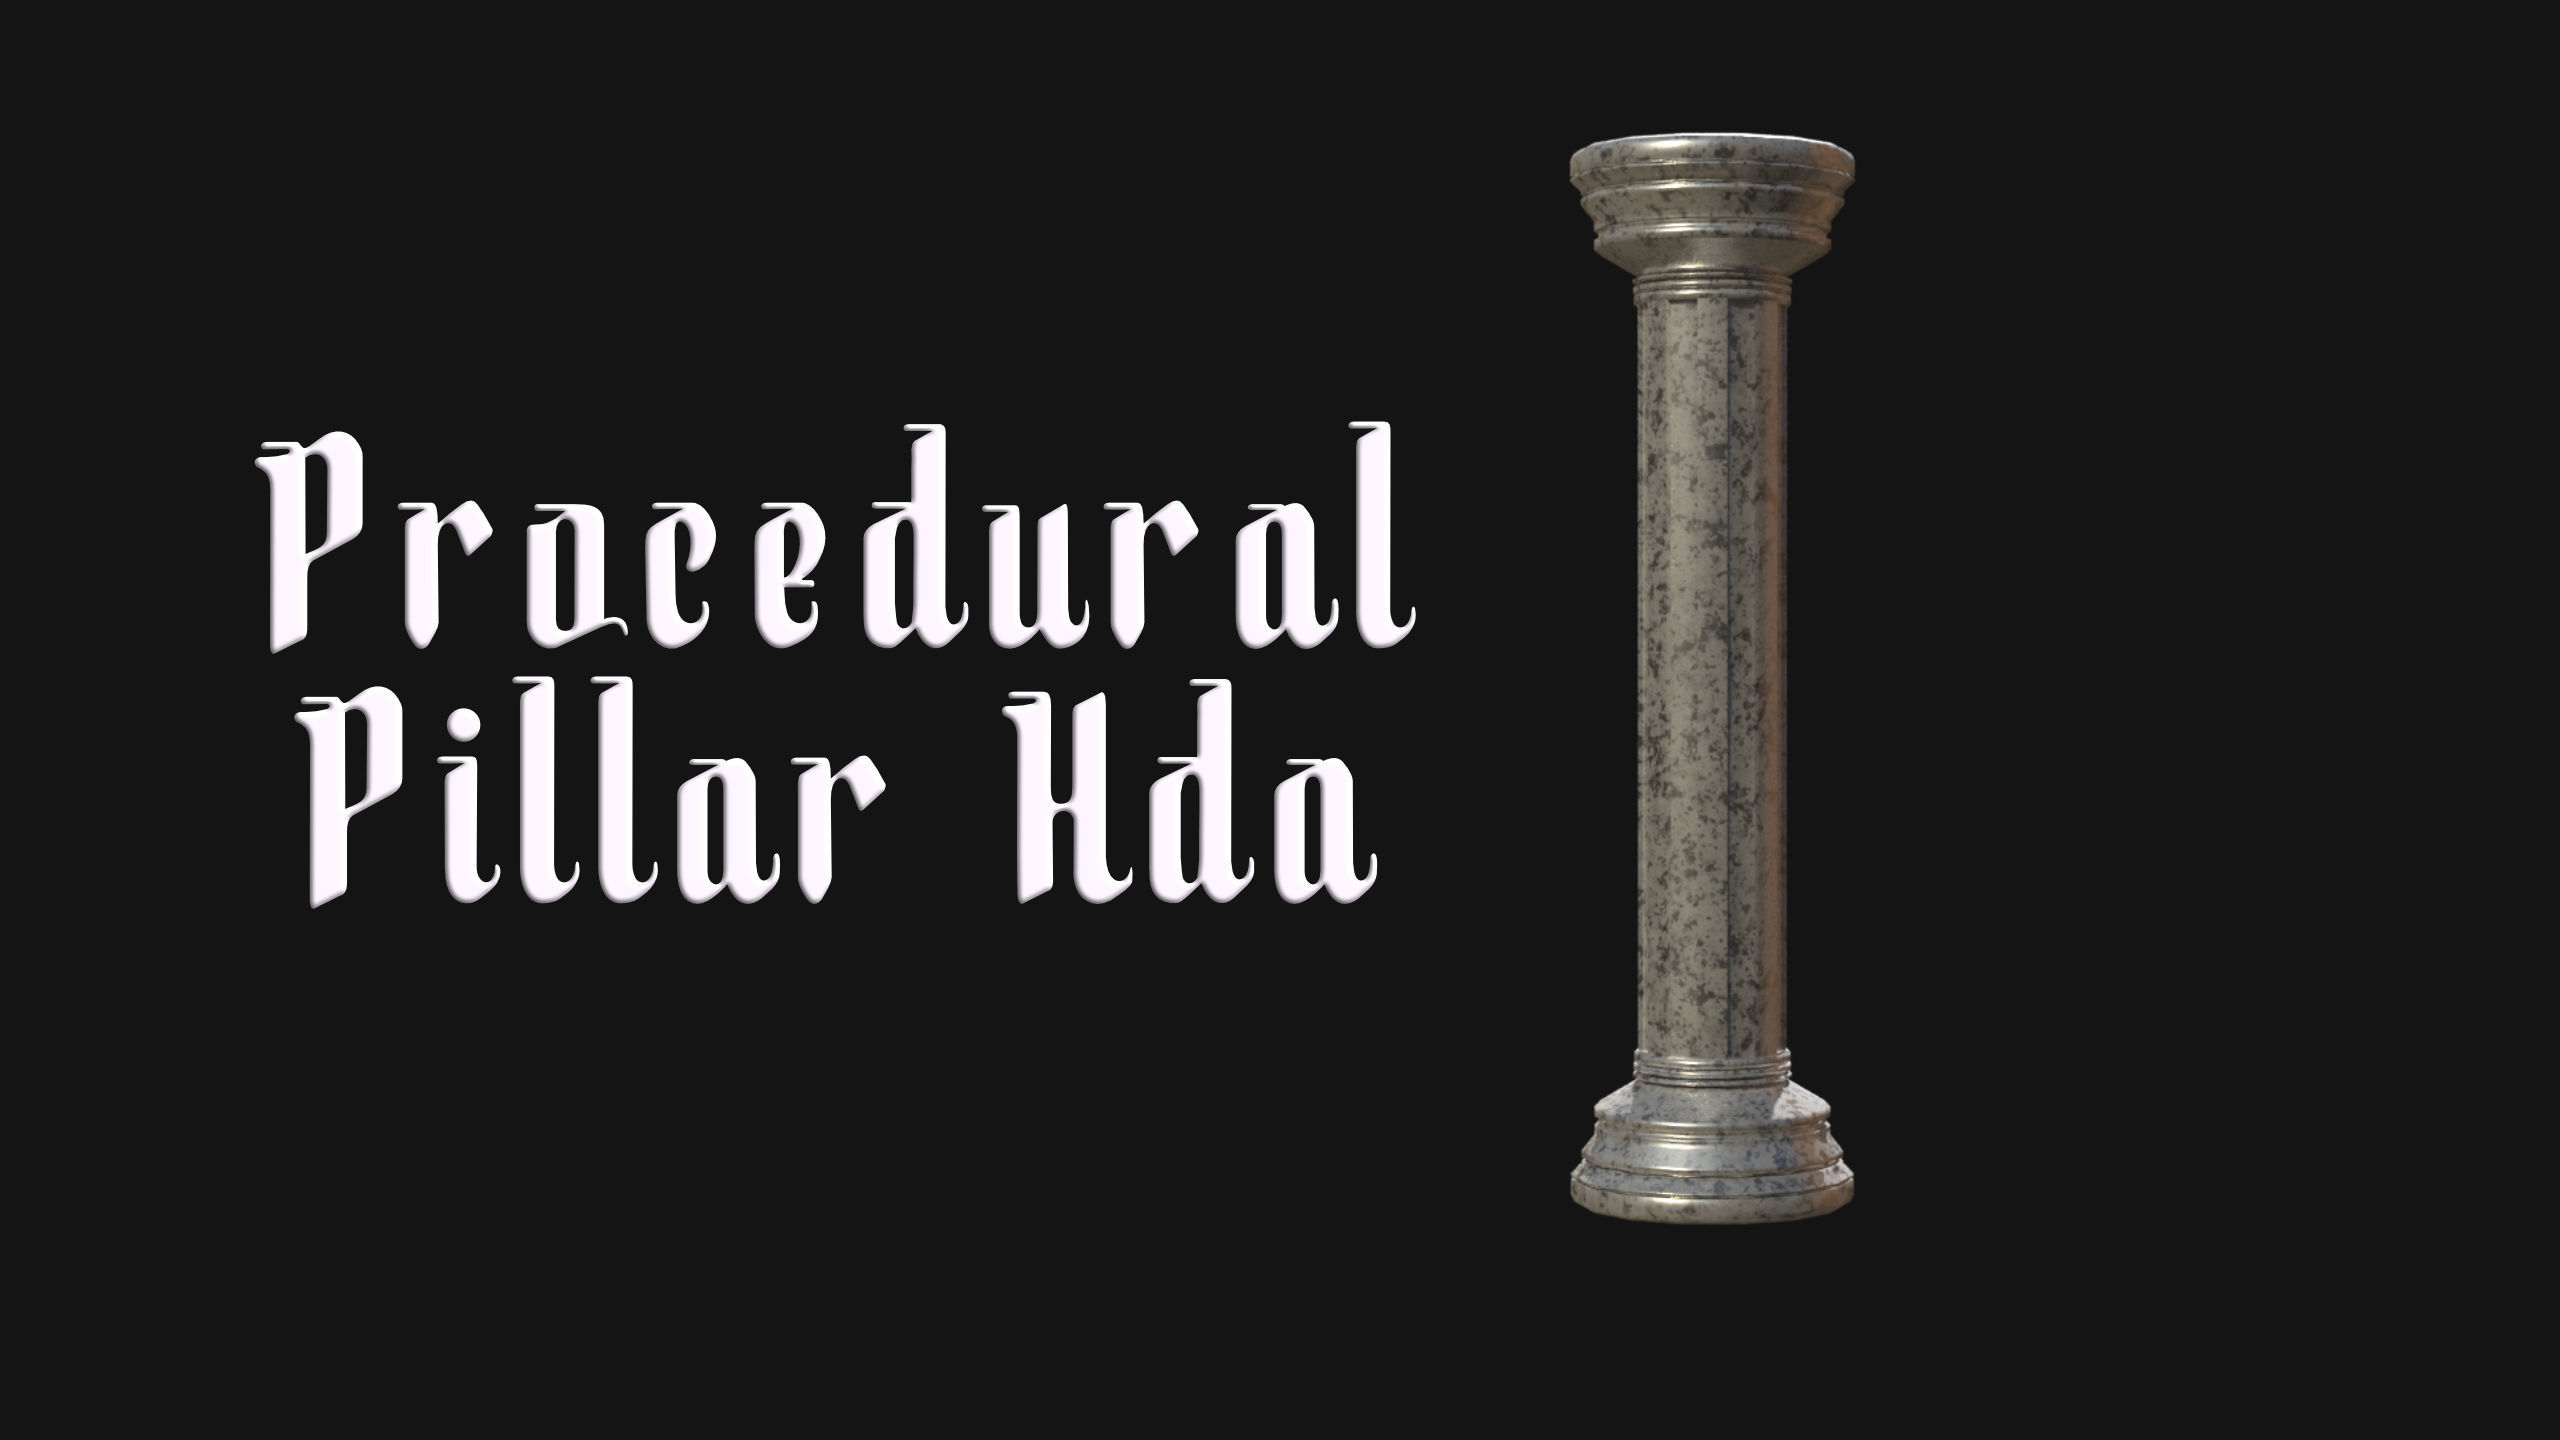 Procedural pillar column generator Hda